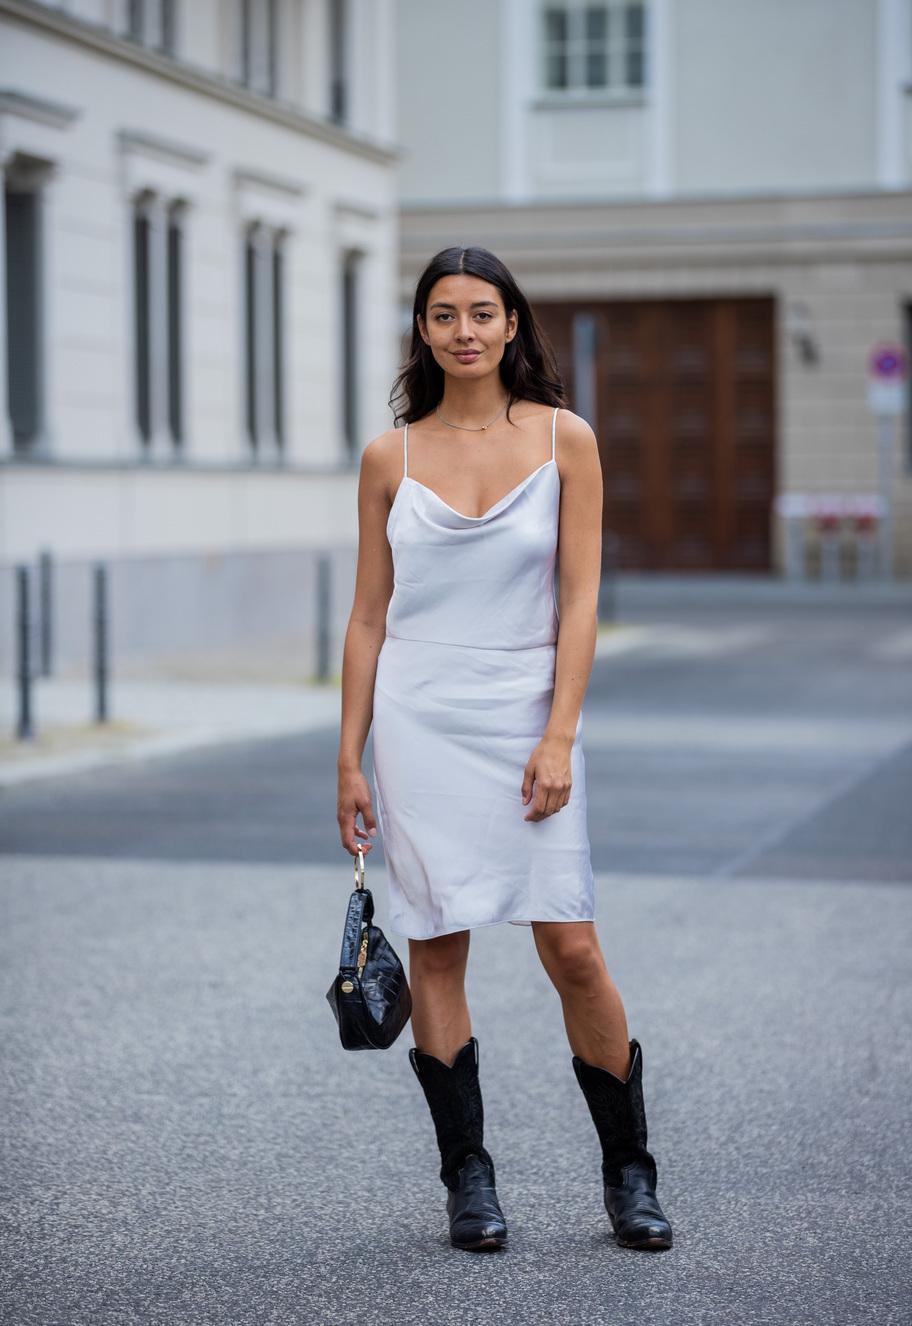 Vestido lencero con botas